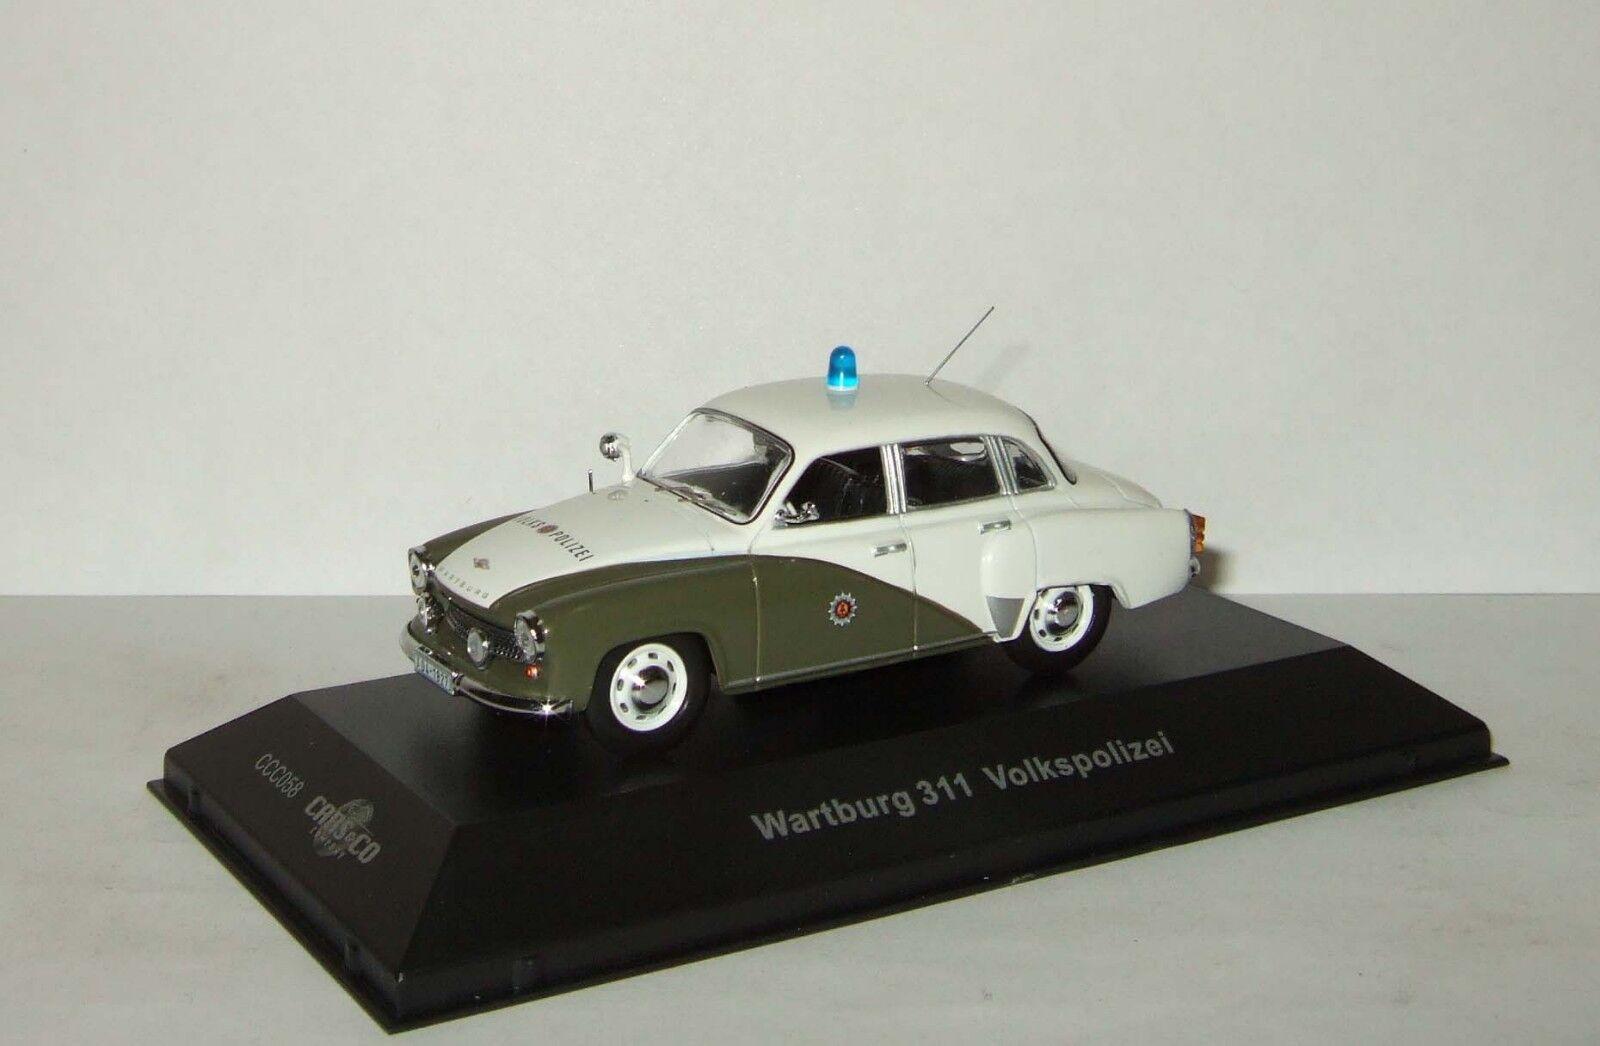 1 43 IST Cars & Co Wartburg 311 Volkspolizei limousine CCC058